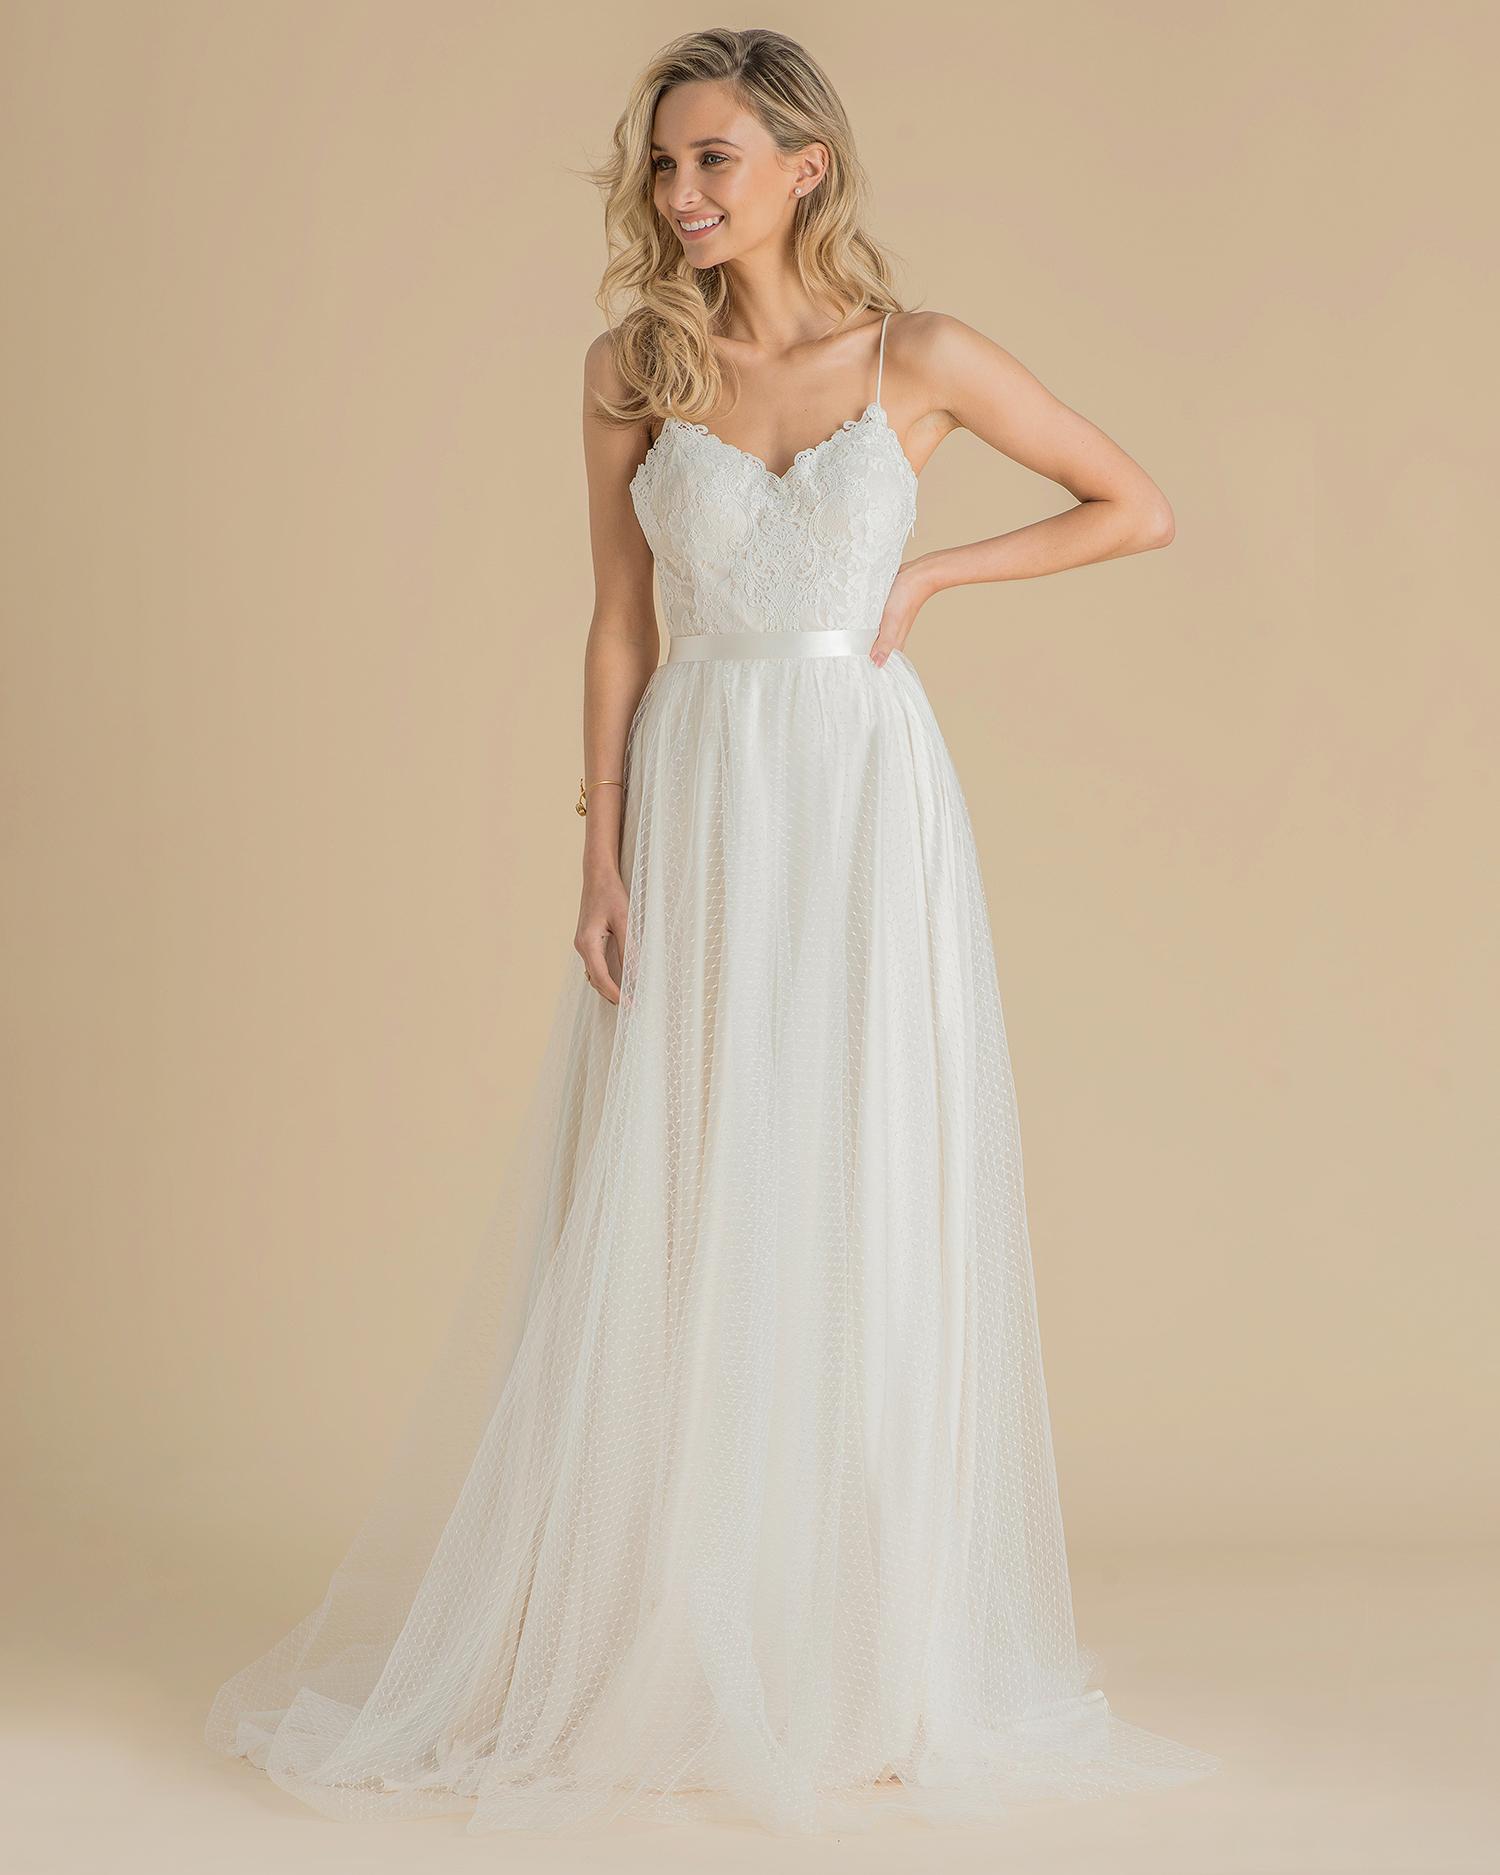 catherine deane wedding dress spring 2019 spaghetti-strap a-line